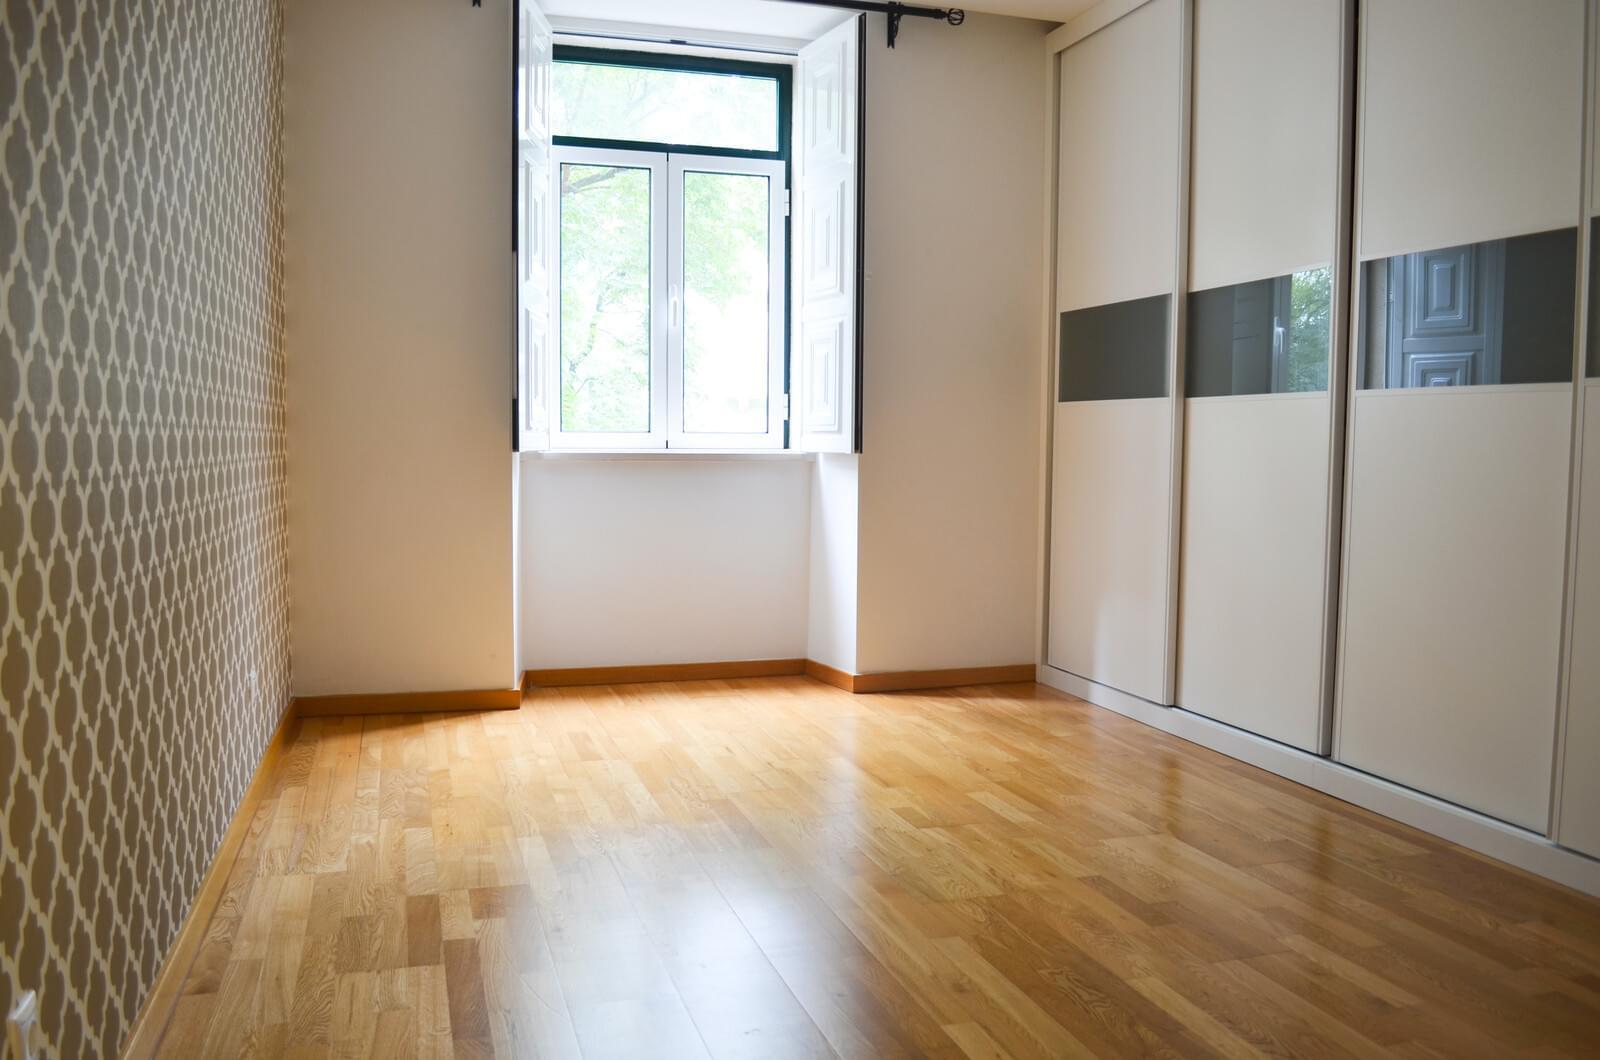 pf18839-apartamento-t2-lisboa-7b8839f3-d001-48a3-a4cb-33949f5da122